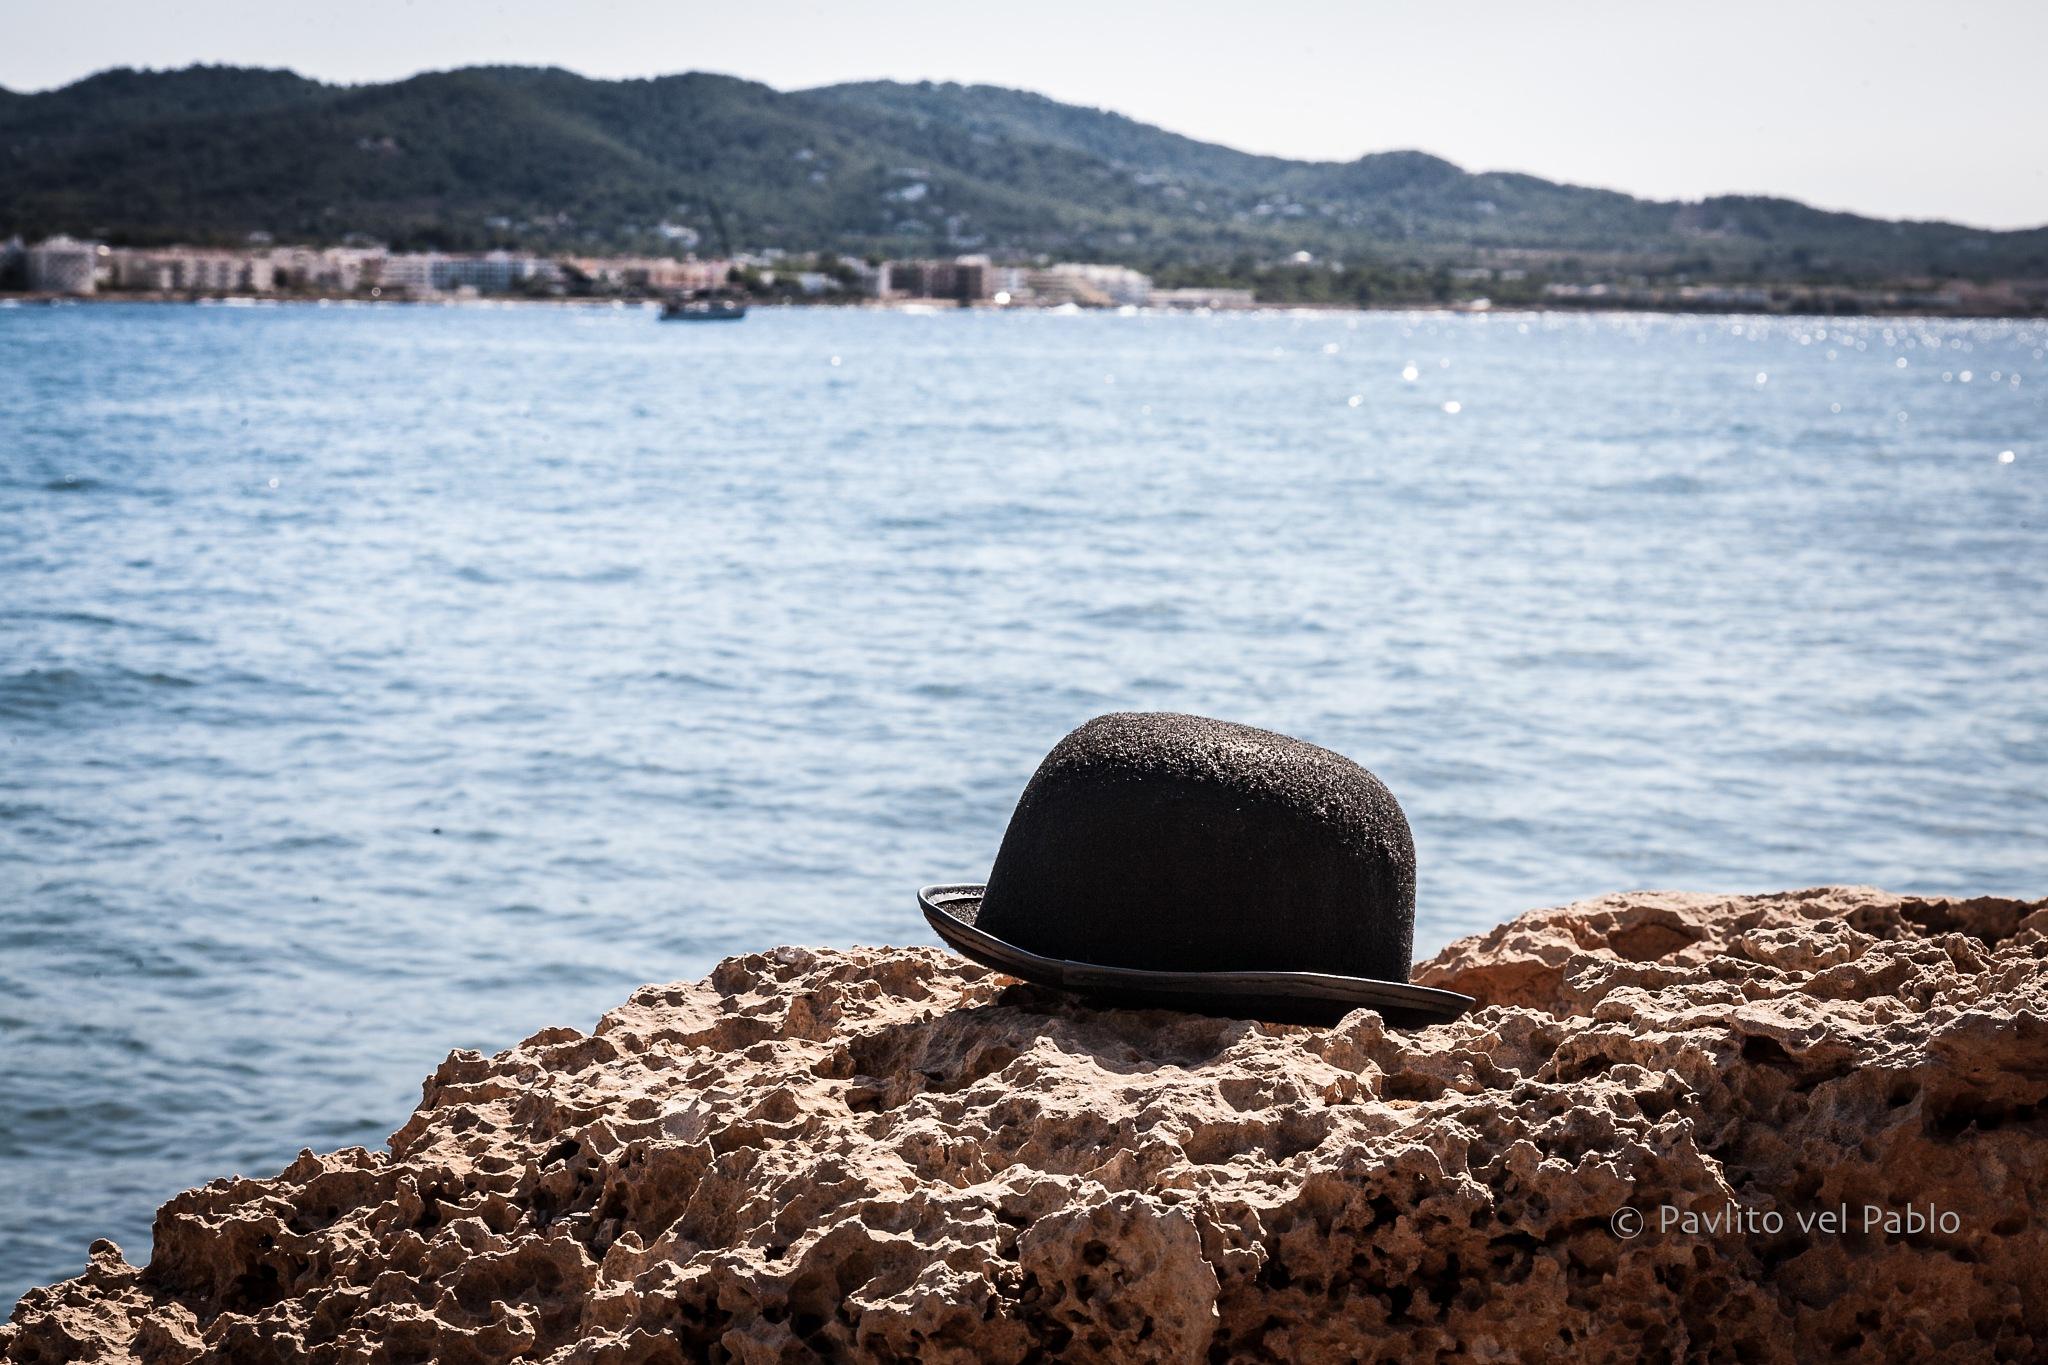 Ibiza>,> by pavlitovelpablo